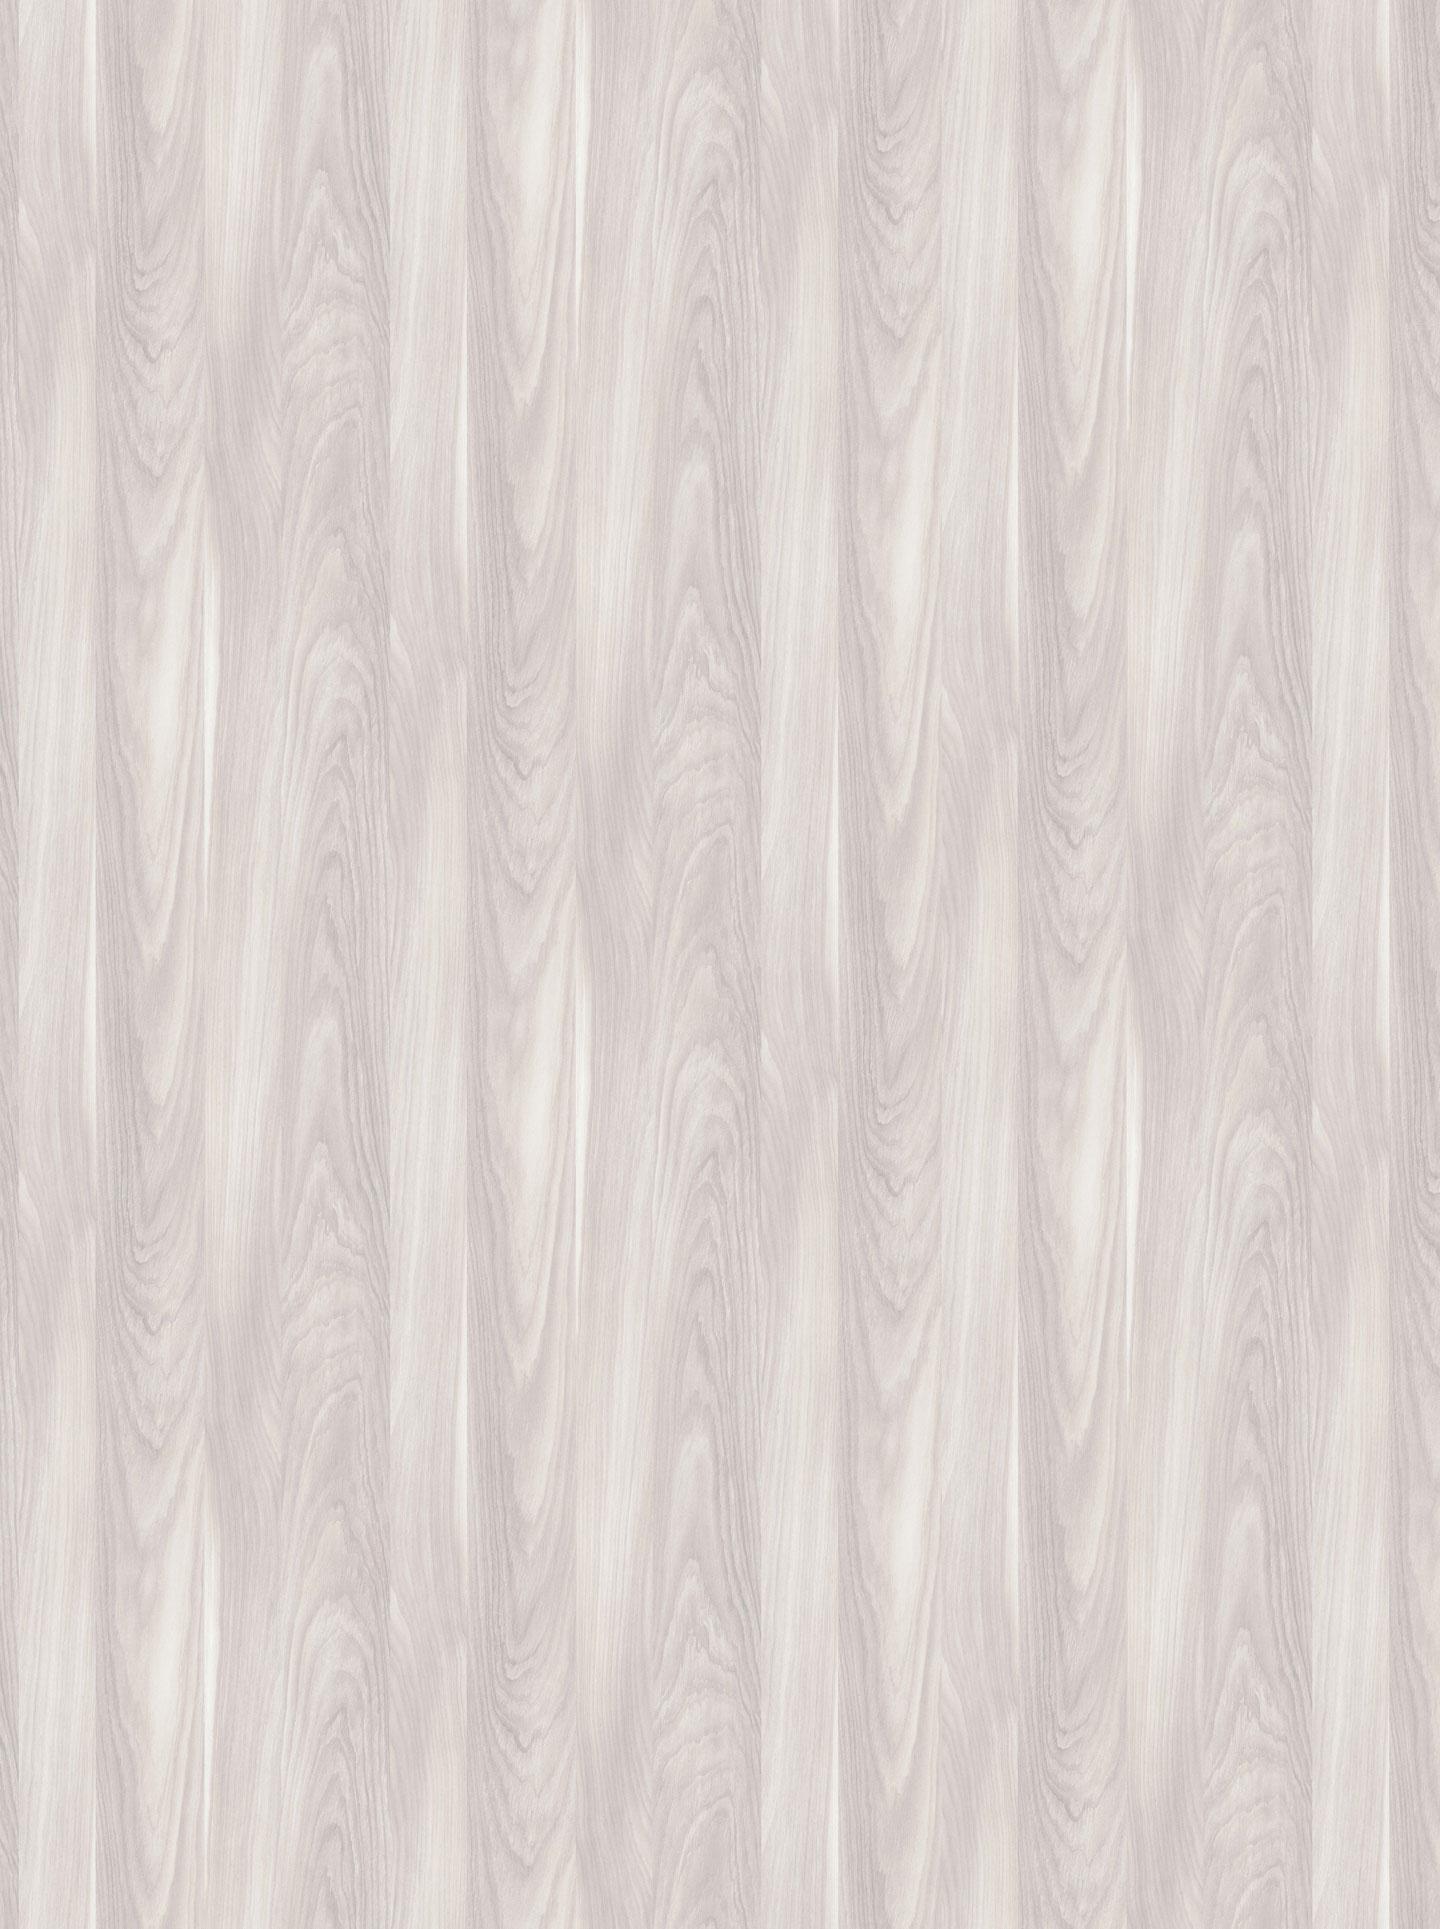 Terra Walnut Light Blonde